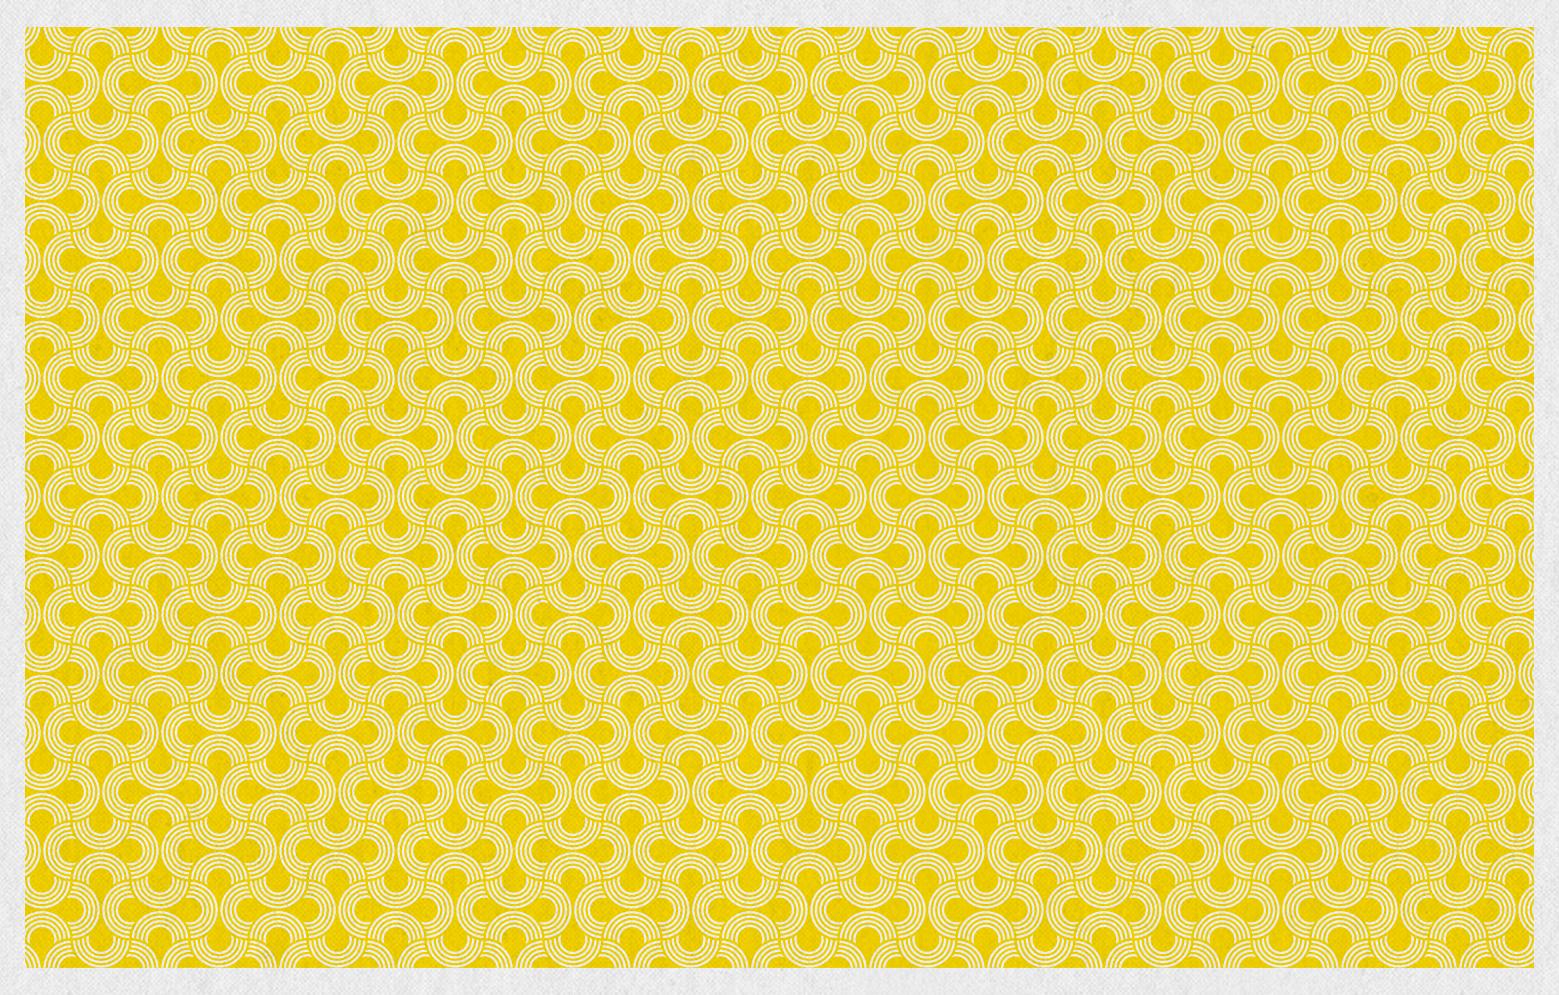 KRAUME CHOC+ Patern gelb